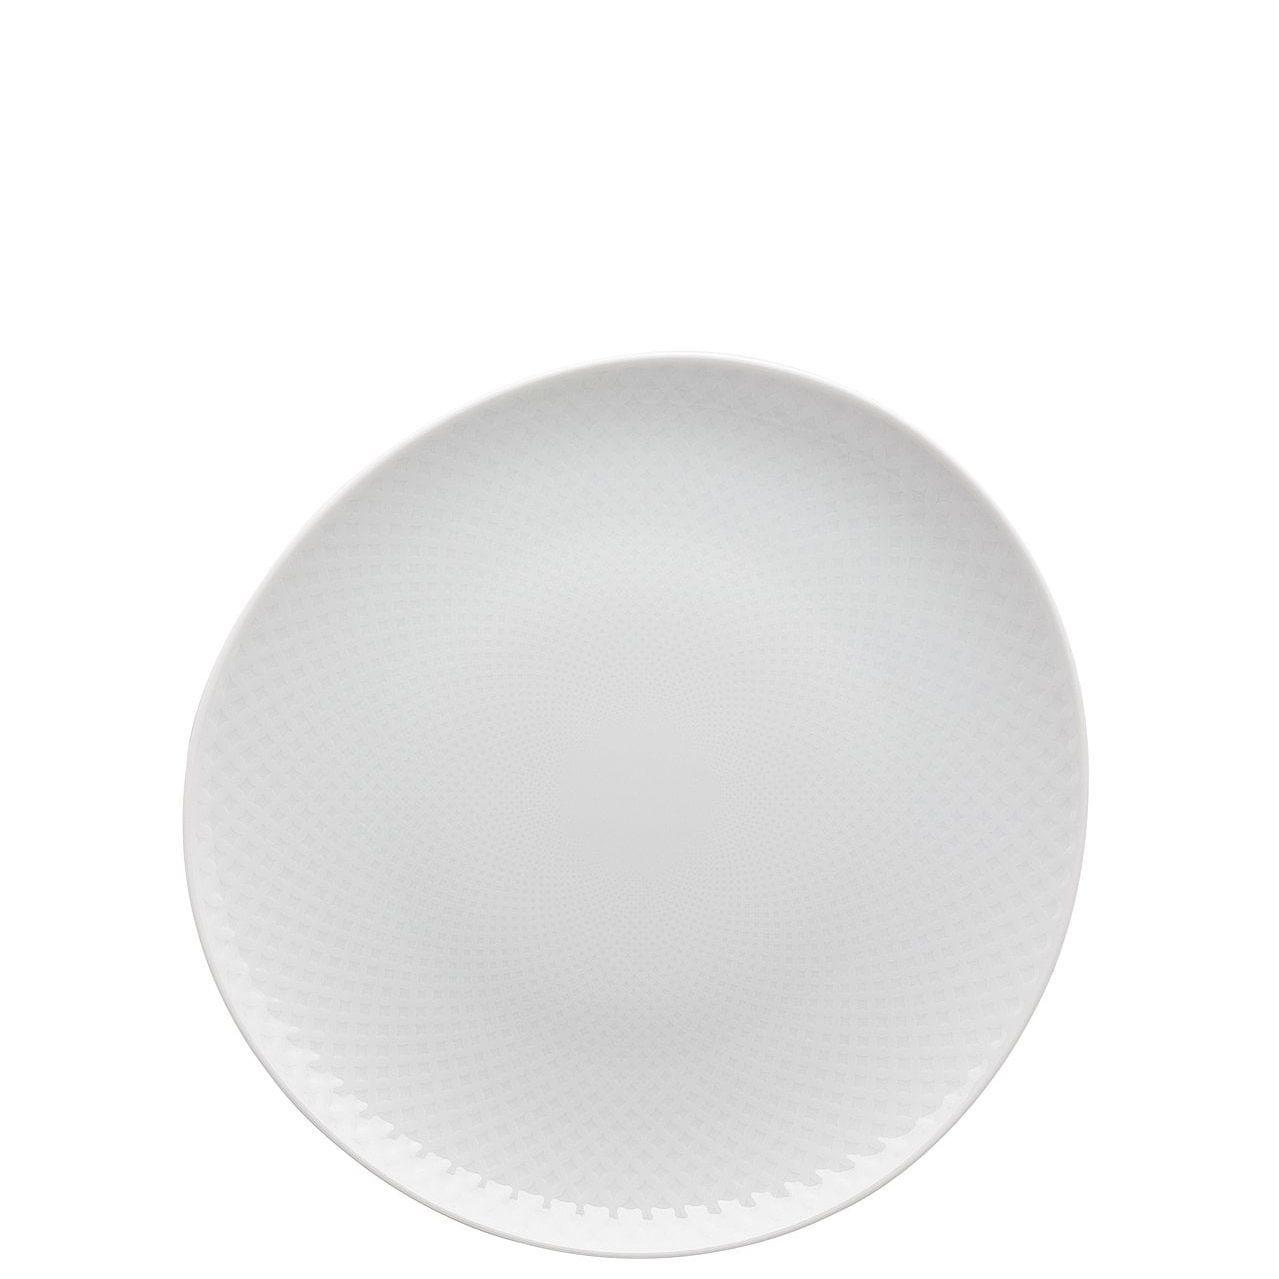 Rosenthal Junto ontbijtbord ø 22cm - wit